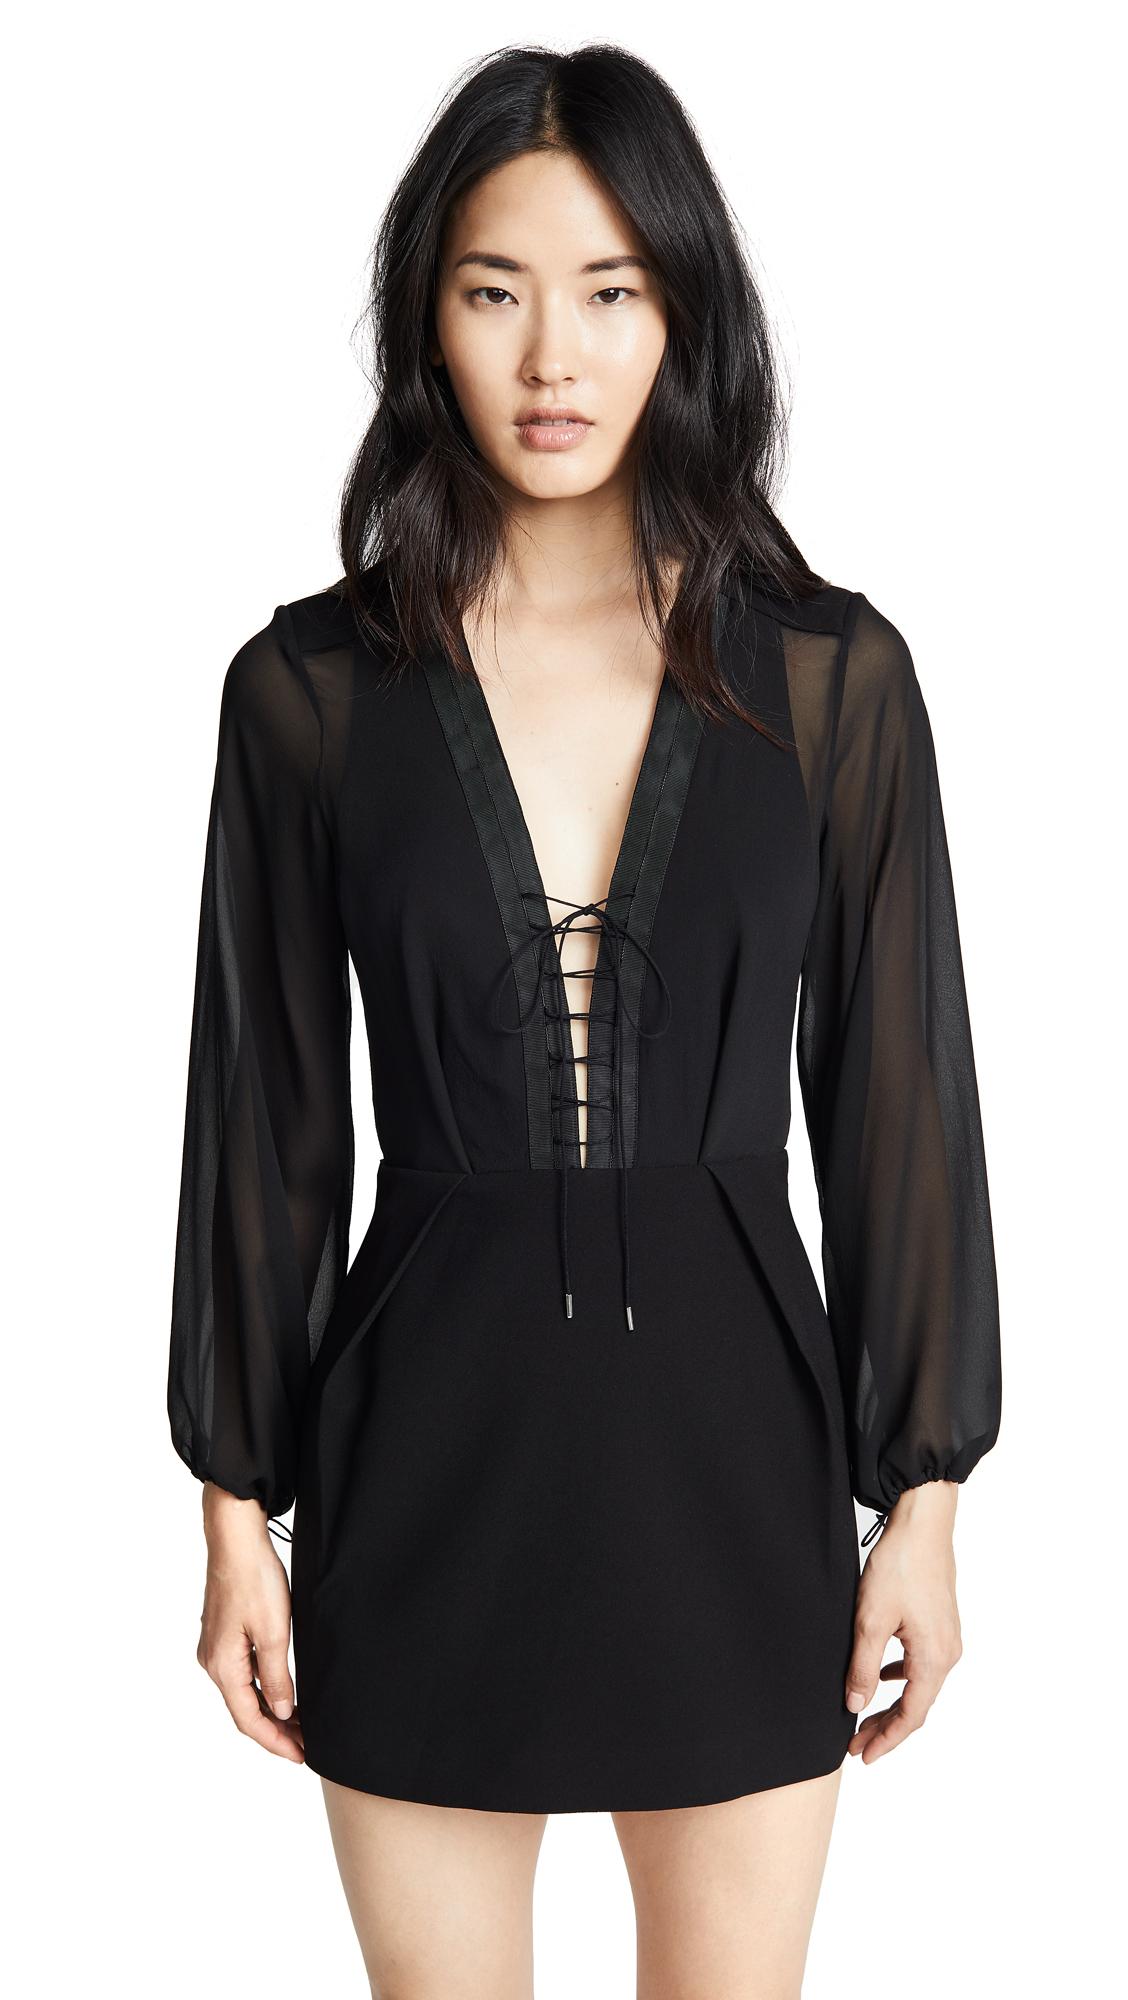 Dion Lee Sheer Solid Lacing Dress In Black